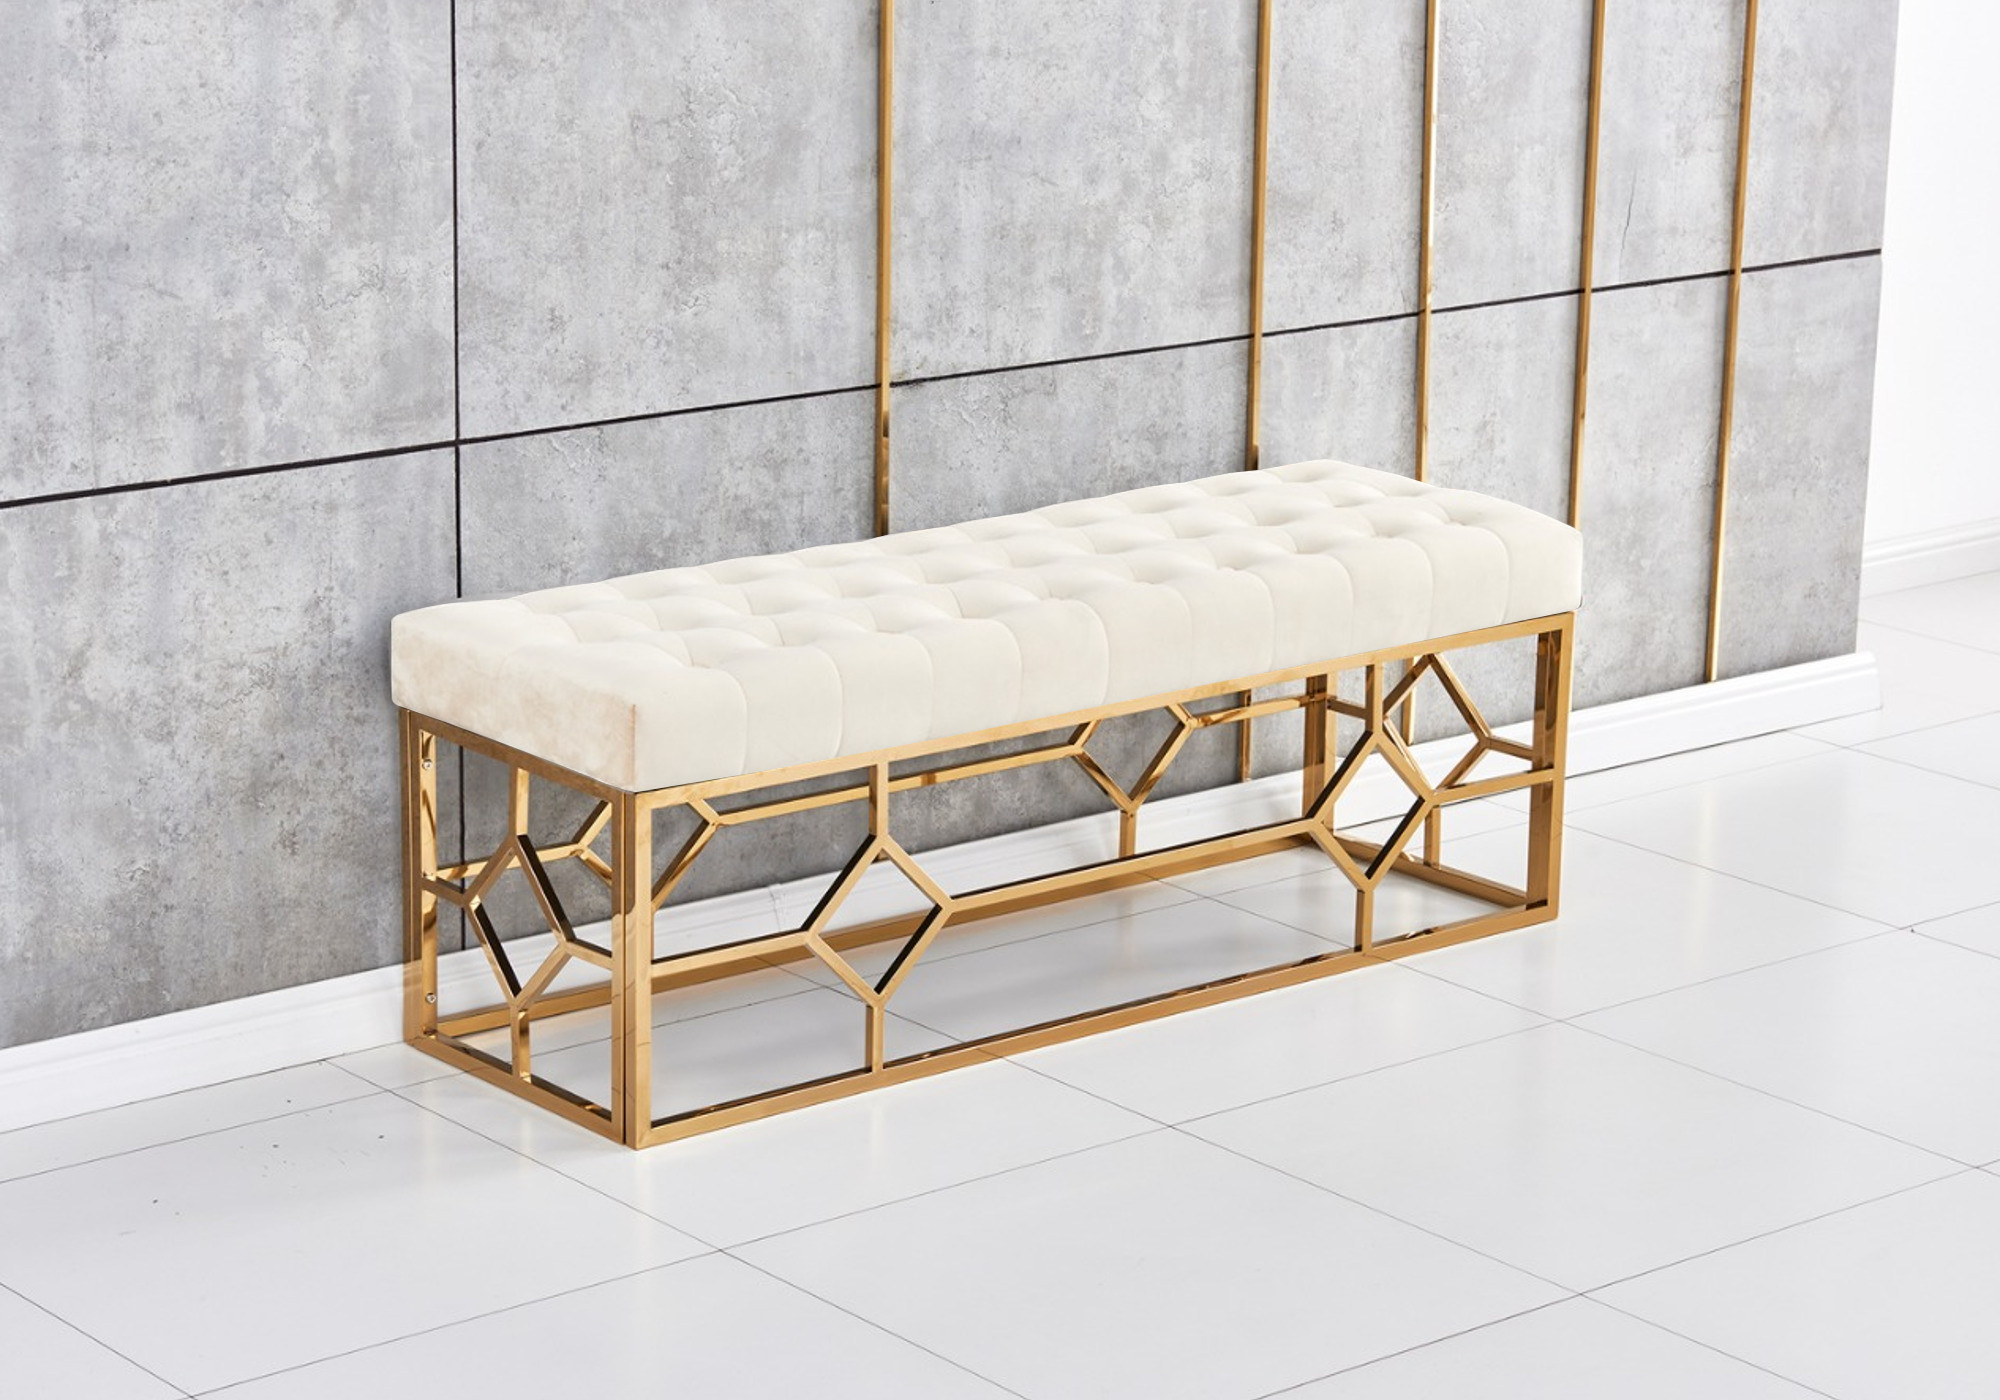 Banc design doré velours beige ABEL